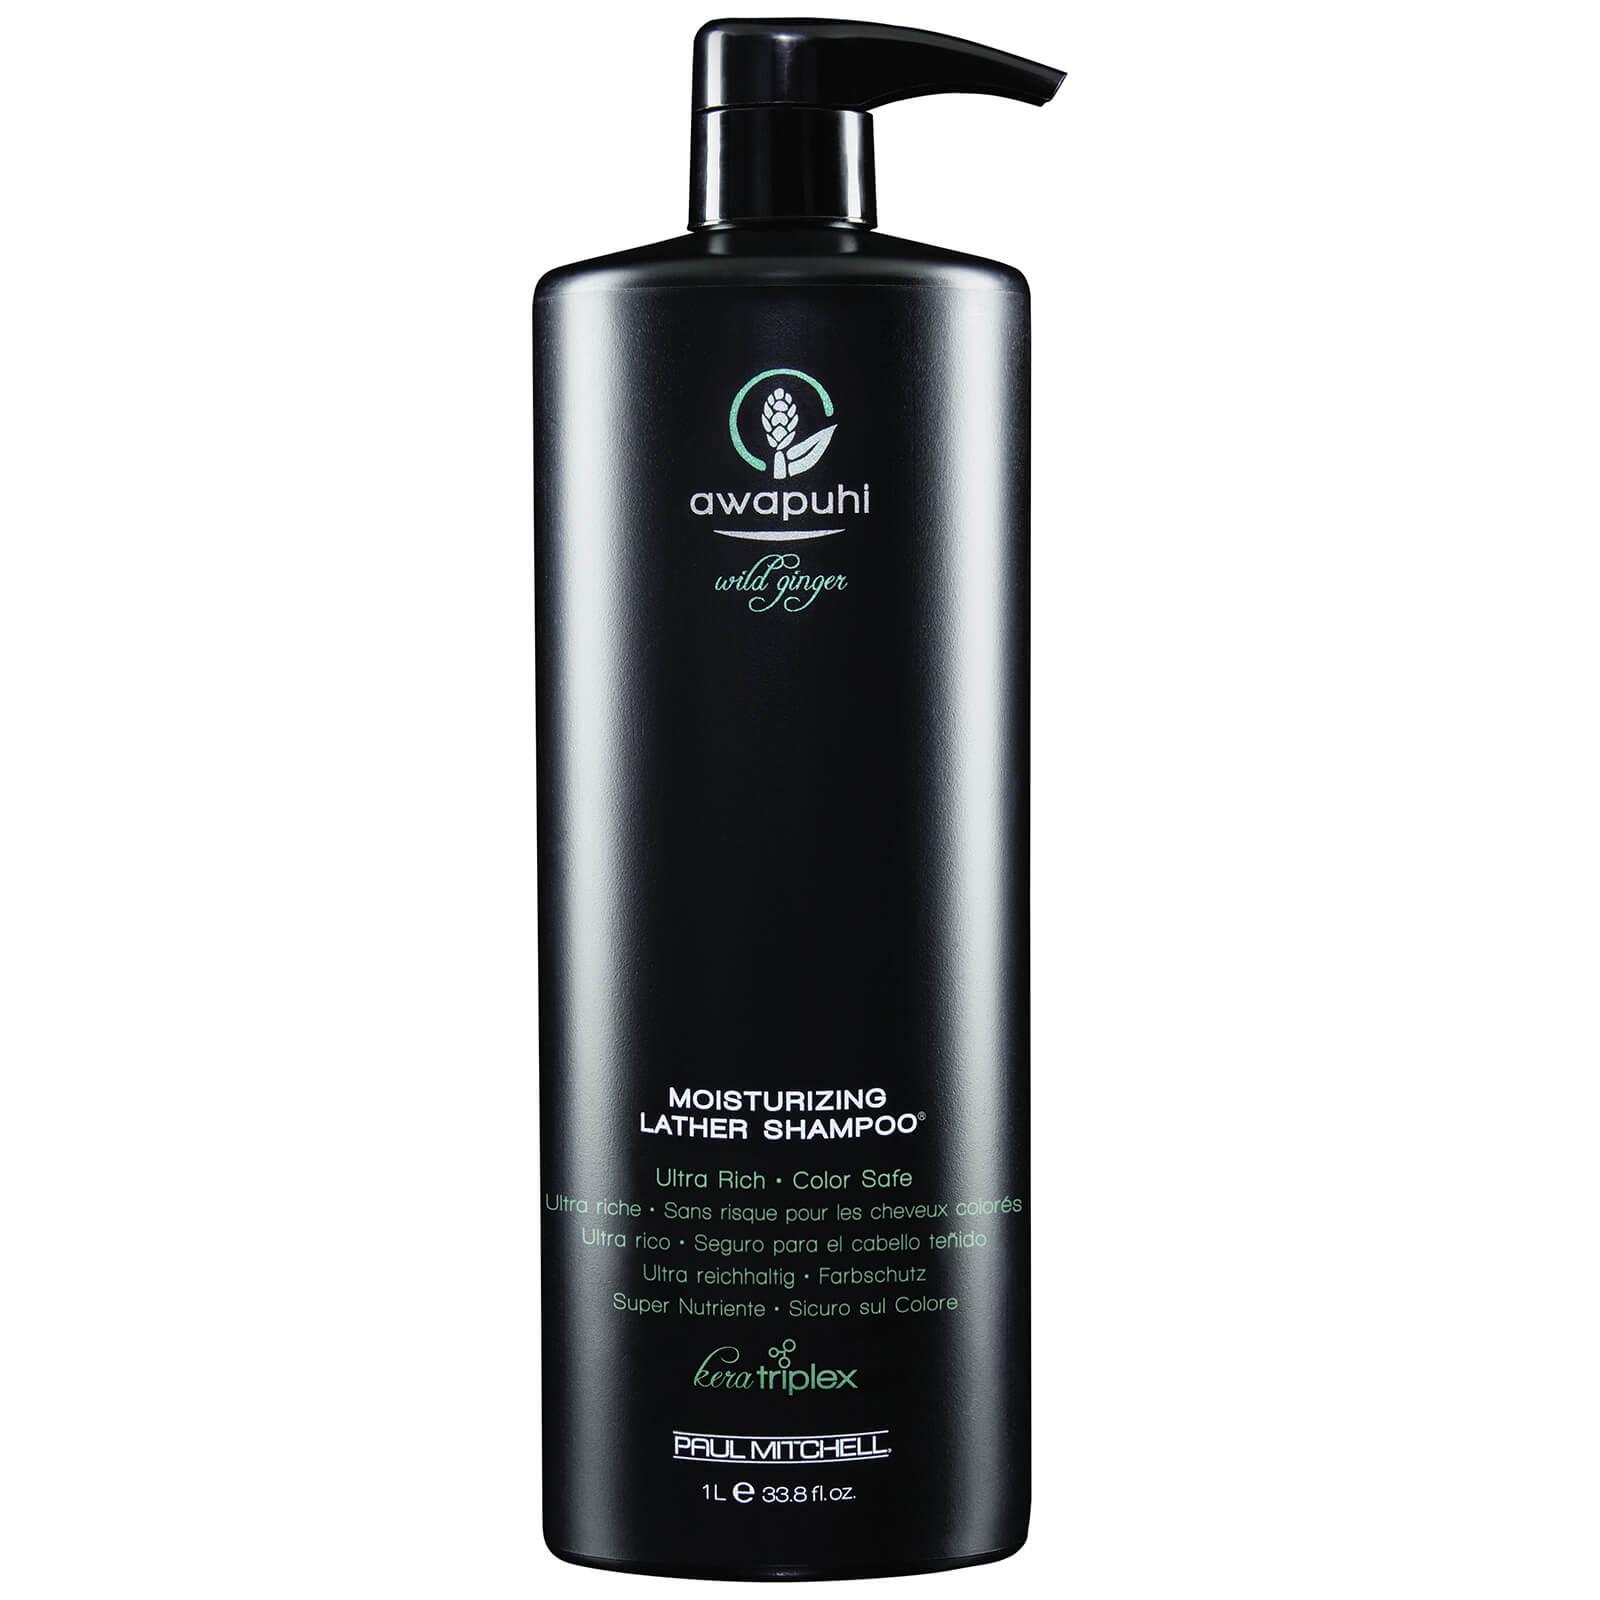 Paul Mitchell Awapuhi Wild Ginger Moisturizing Lather Shampoo 1000ml ... f8a2e514c2